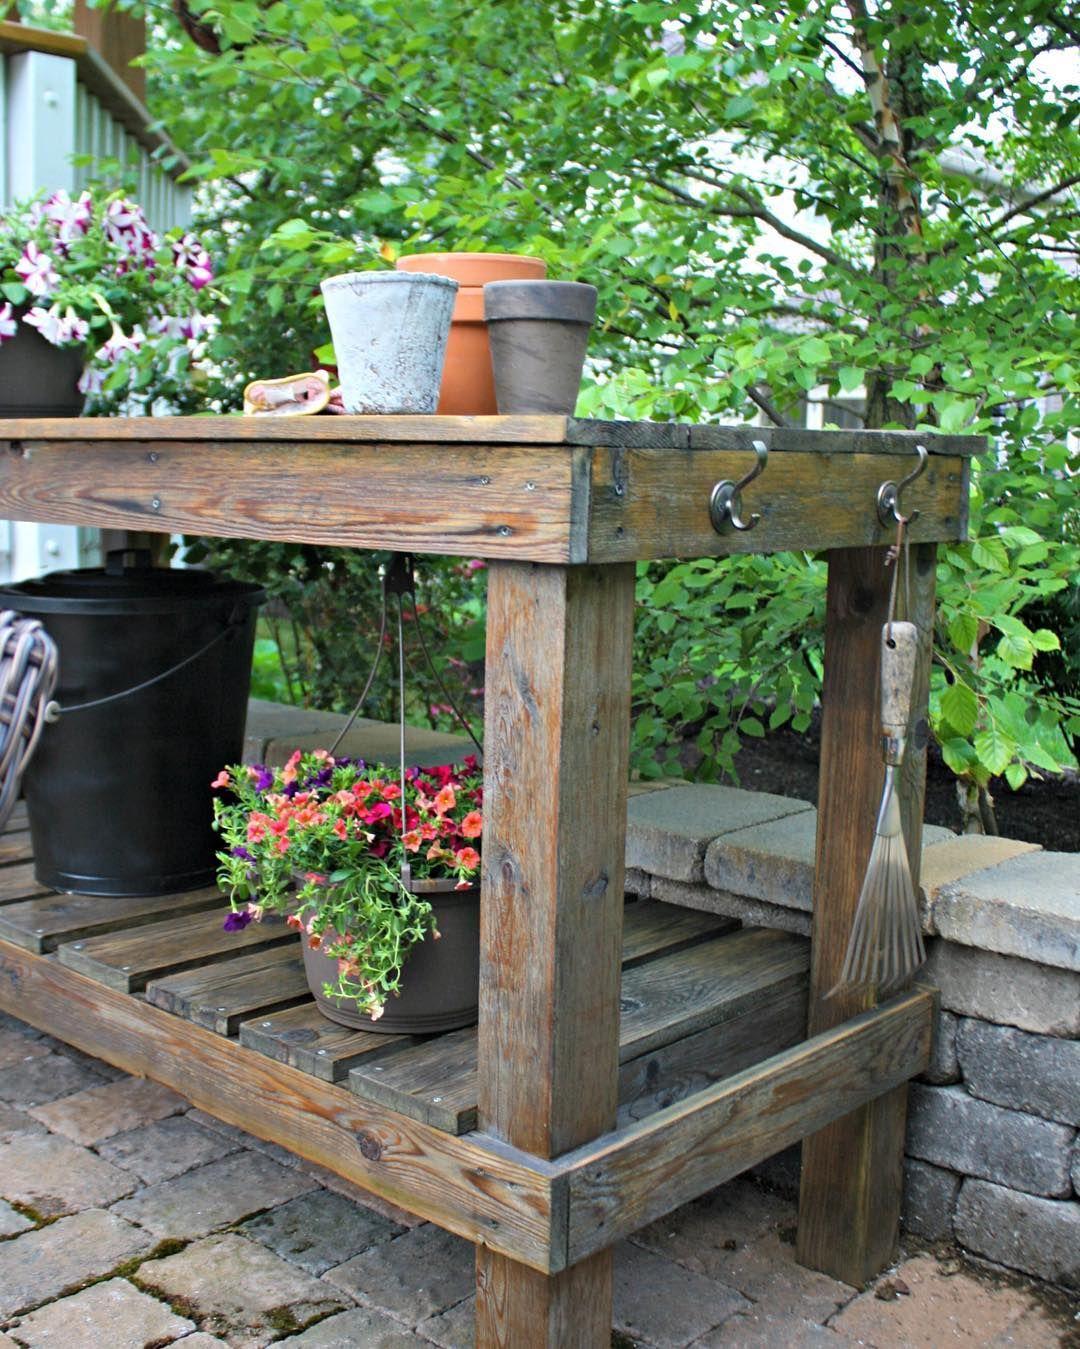 Pin de Halina Pain en Garden Galore | Pinterest | Taller